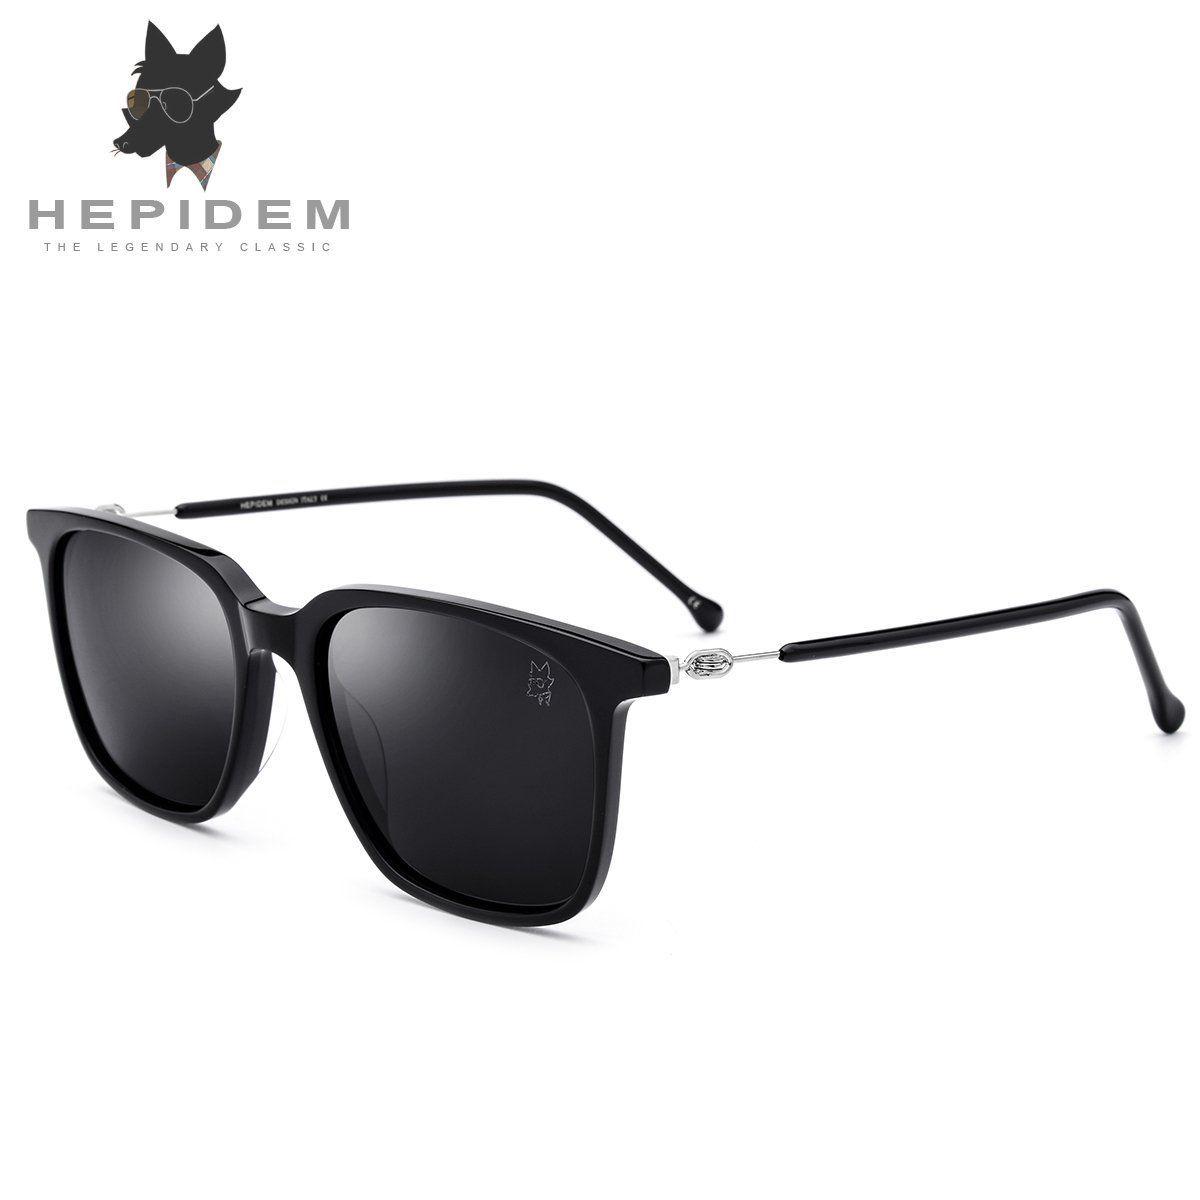 4fe2b55f546 HEPIDEM New Acetate Square Sunglasses Men Driving Mirrored for Women Brand  Designer Polarized Sunglass 5203